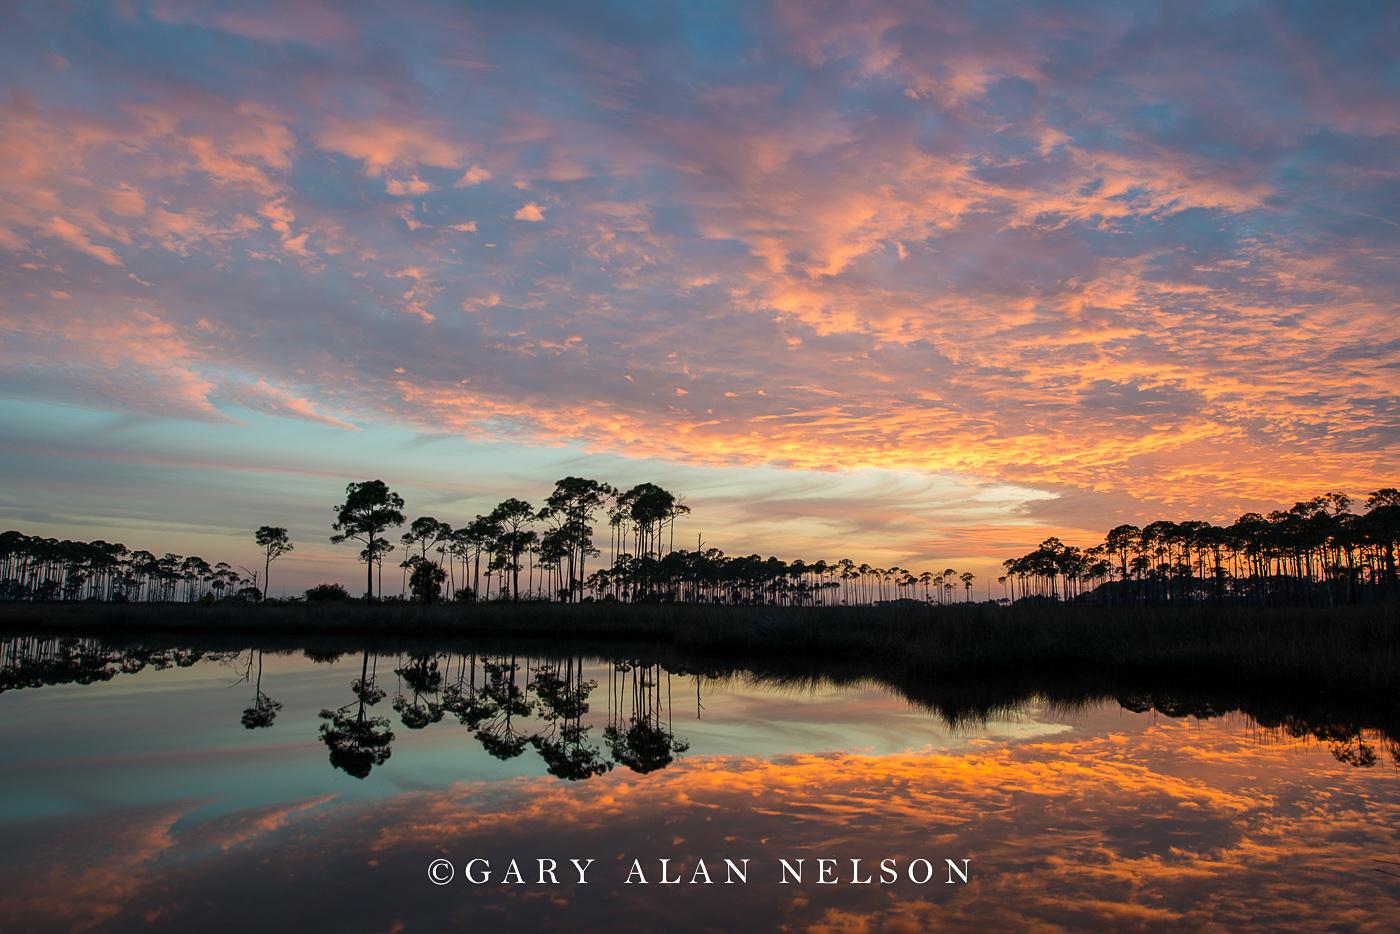 reflections, st. marks national wildlife refuge, silhouettes, photo